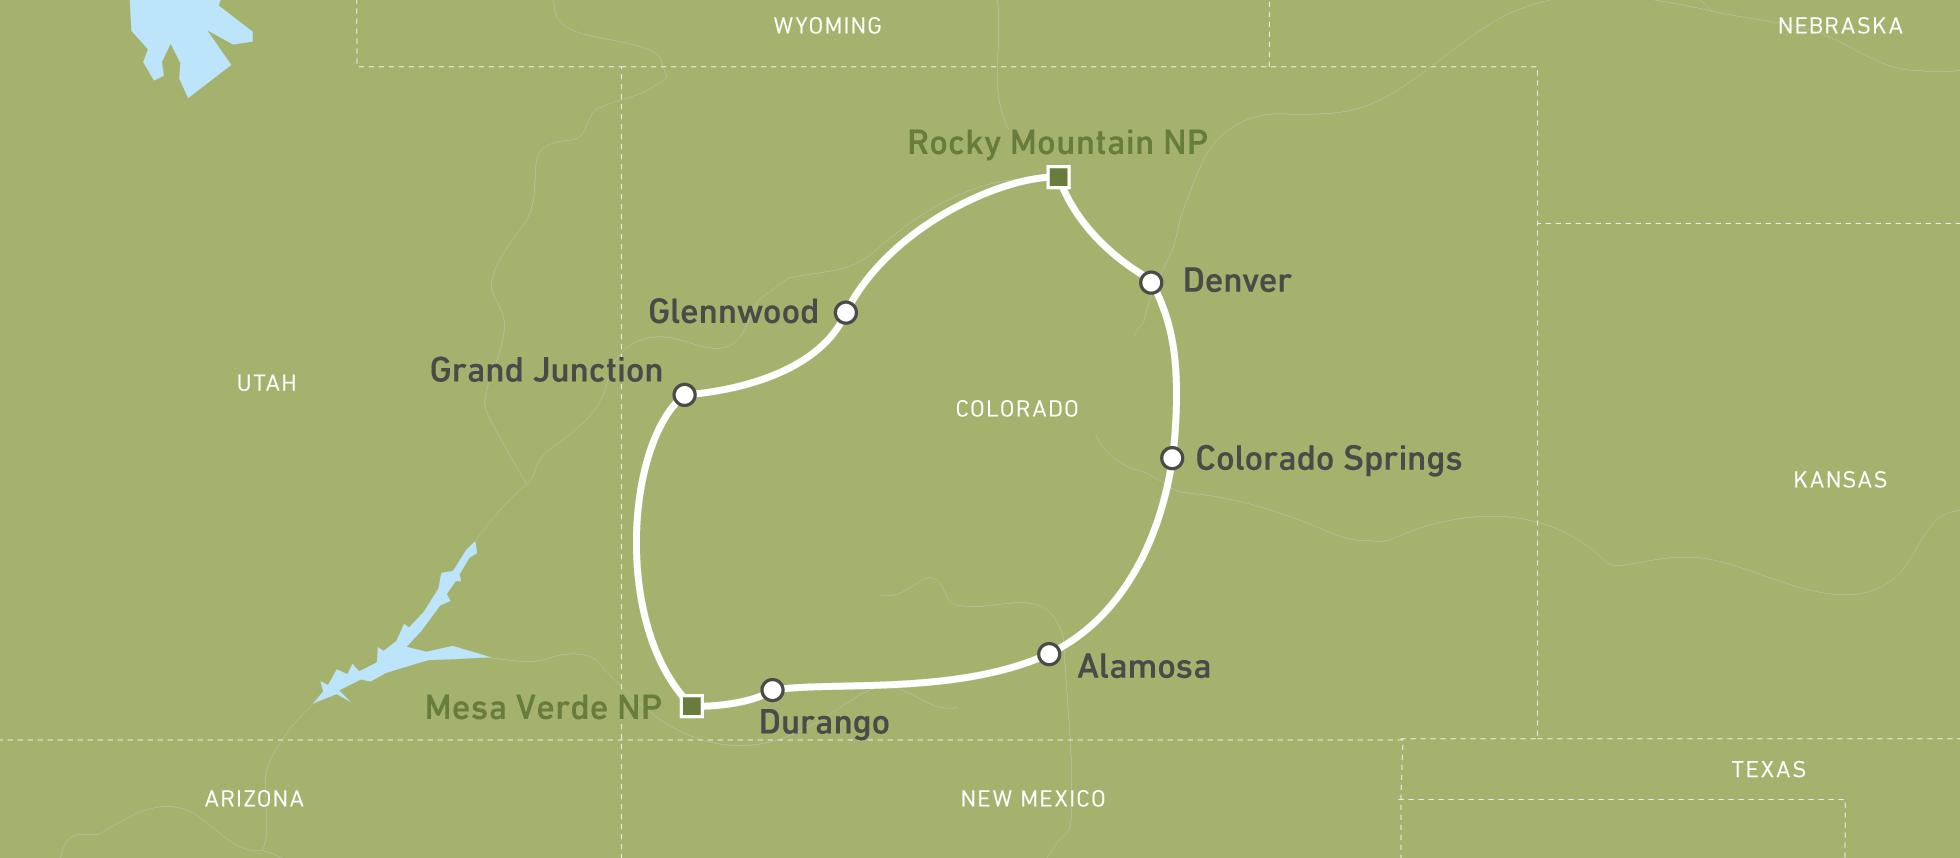 Colorado Karte Fluss.Autoreise Durch Den Rocky Mountain State Der Usa Canusa